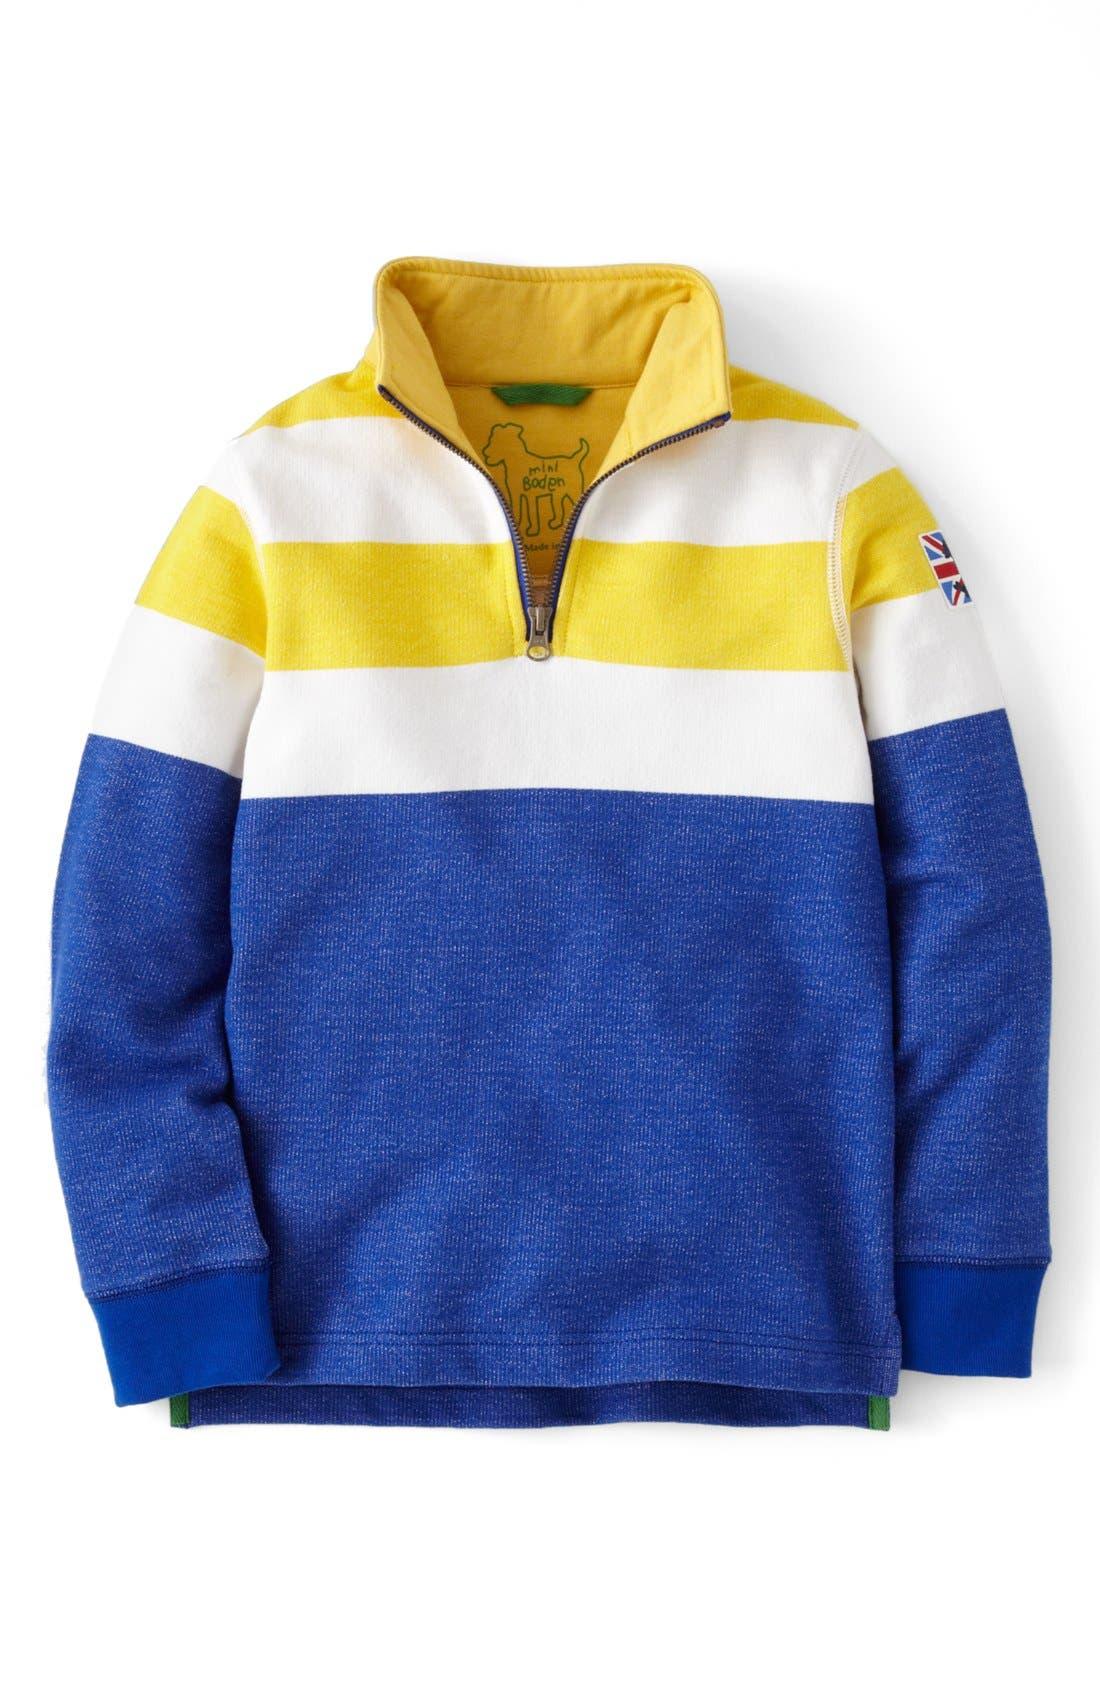 Alternate Image 1 Selected - Mini Boden Half Zip Sweater (Toddler Boys, Little Boys & Big Boys)